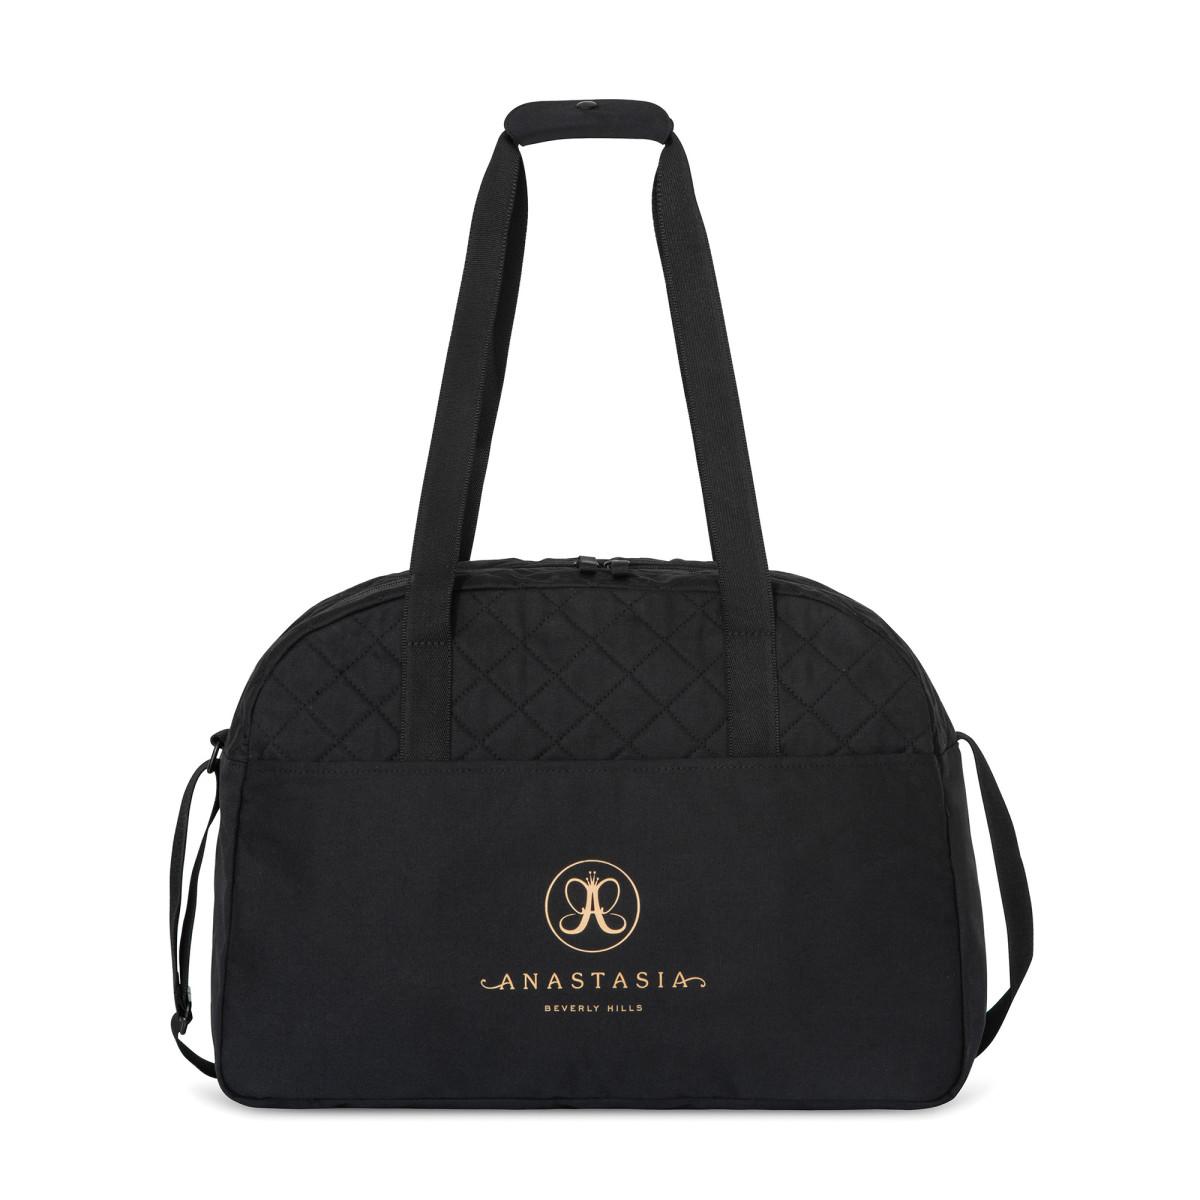 Gemline 4311 - Madeline Quilted Weekender Bag